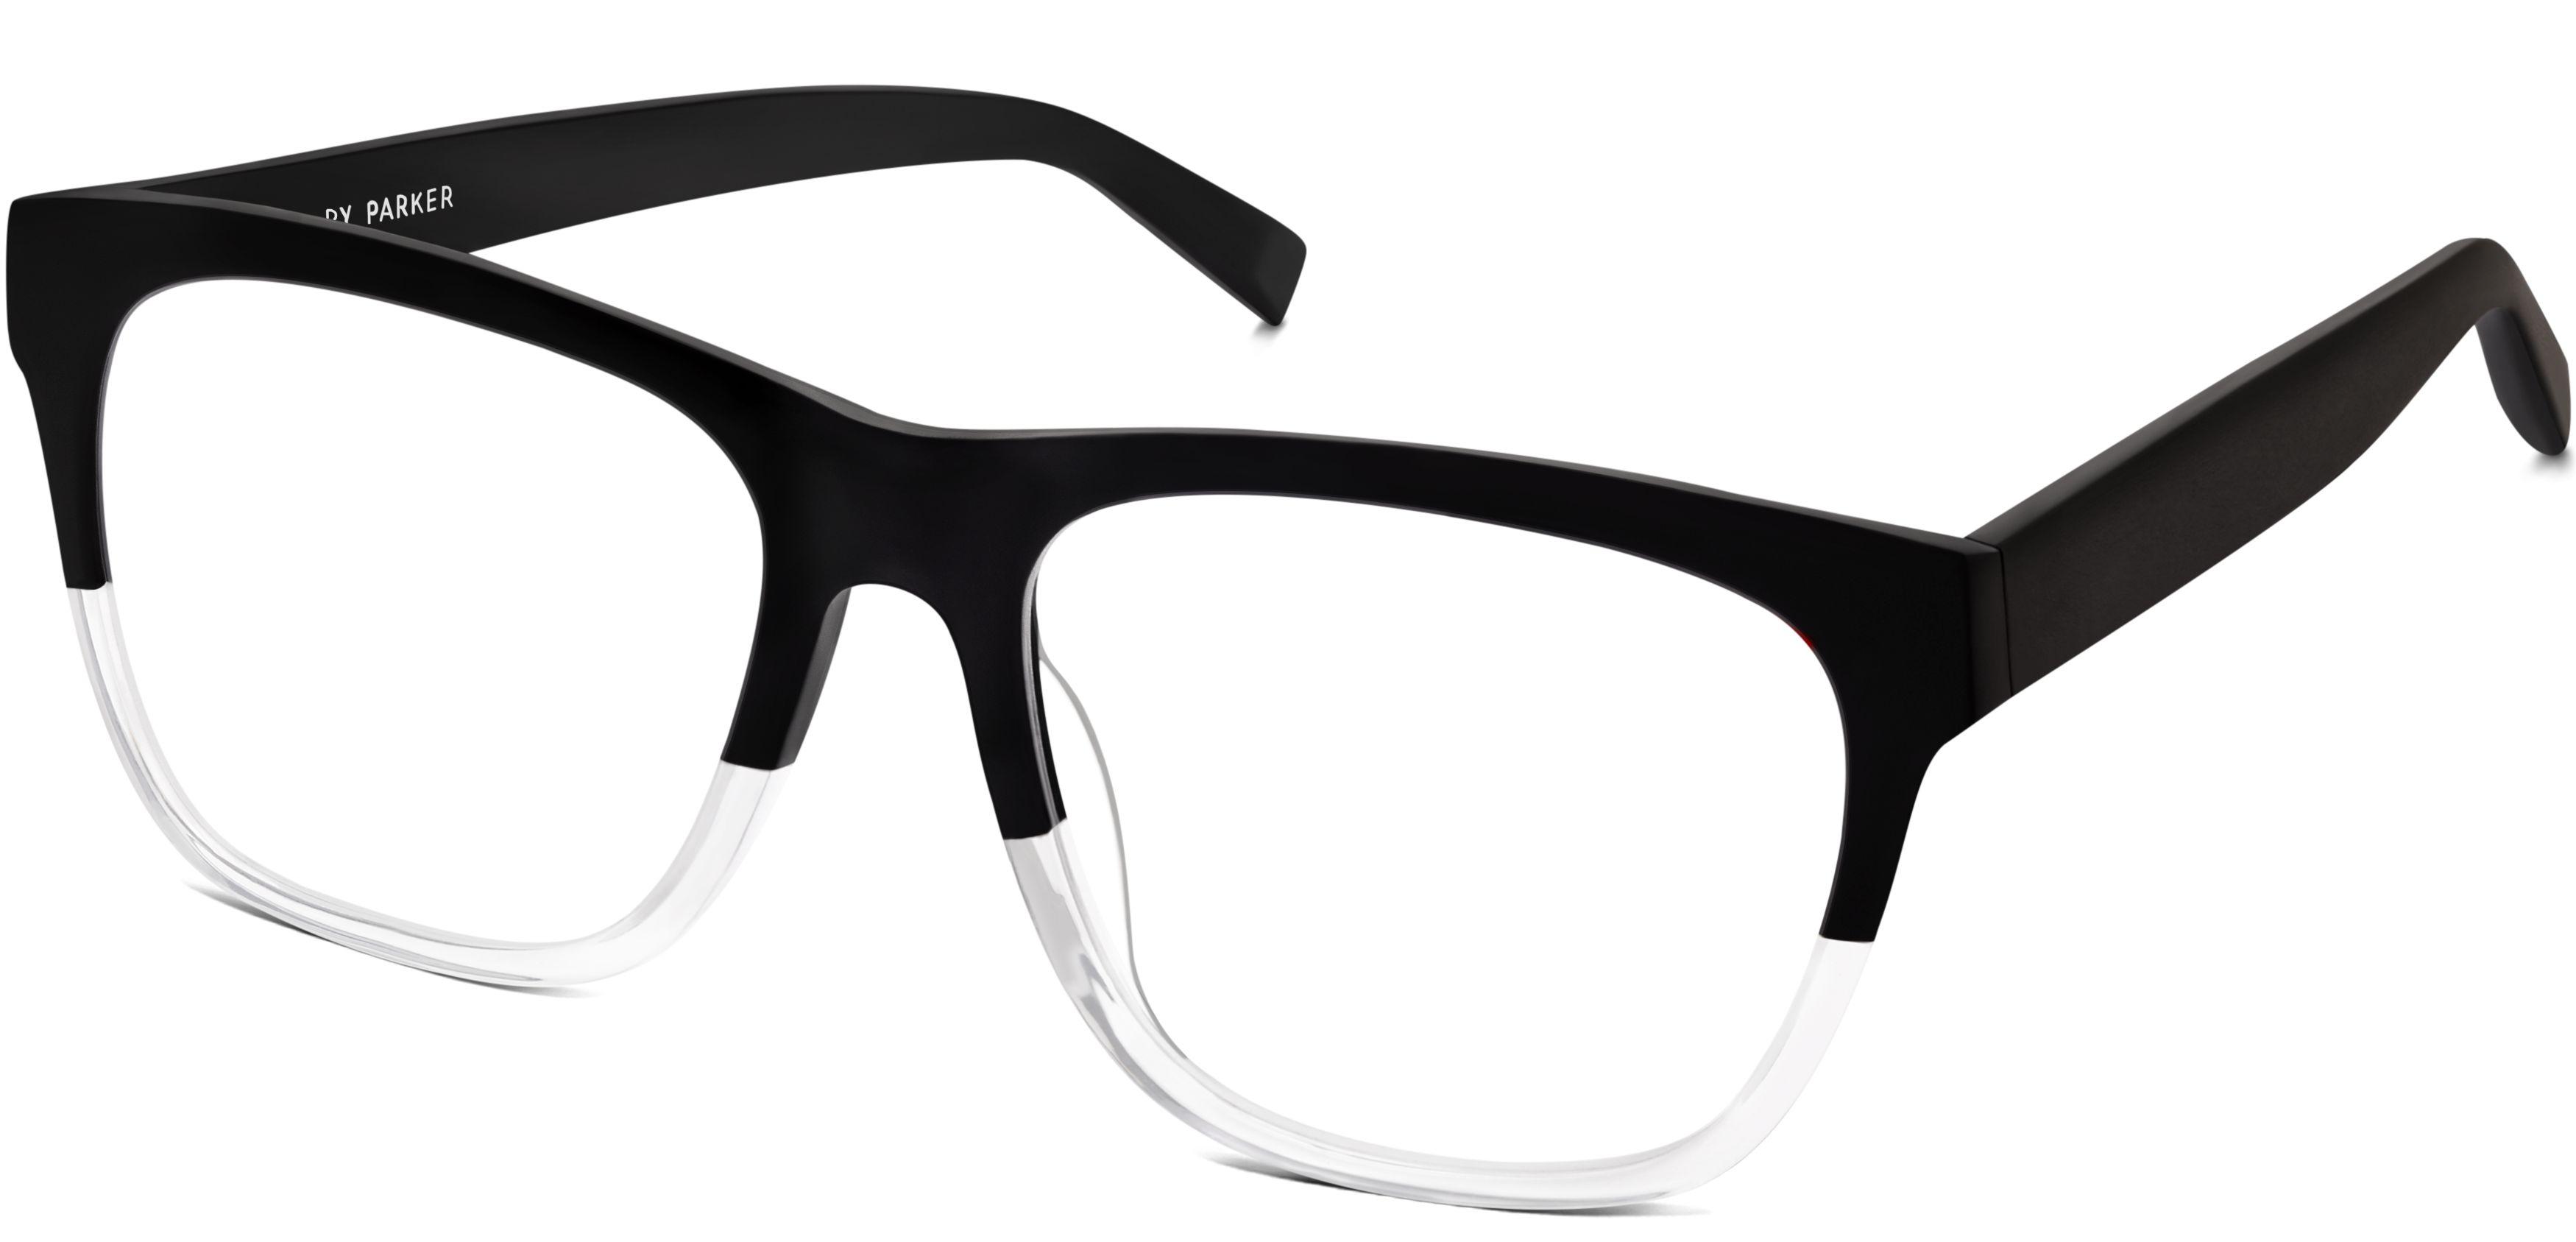 6f364395372c Lowry Eyeglasses in Jet Black Fade for Men